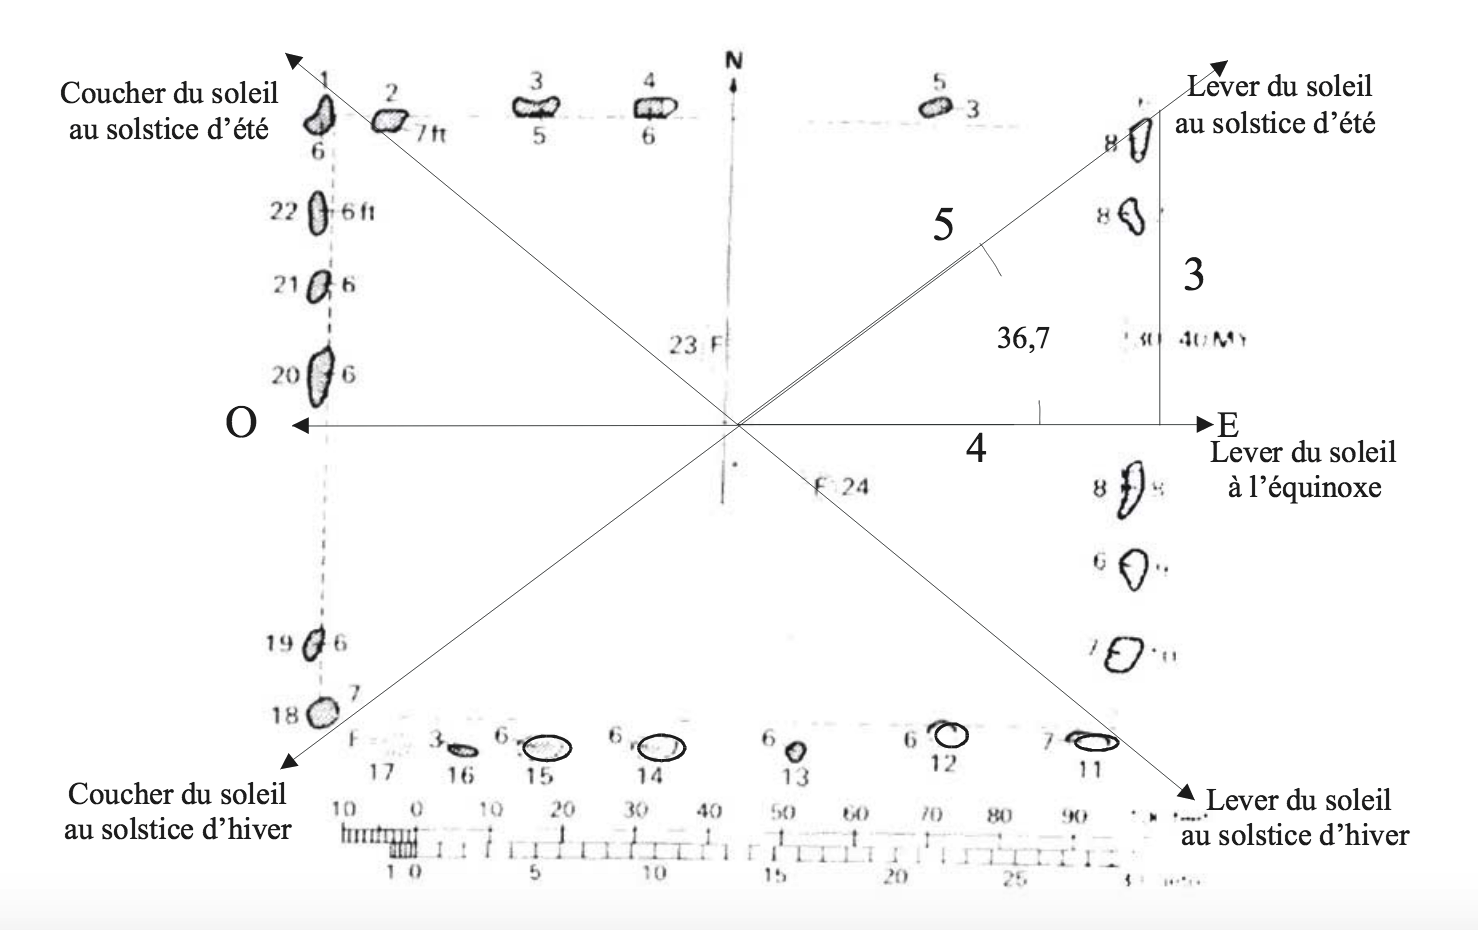 2016-05-27 18:22:38